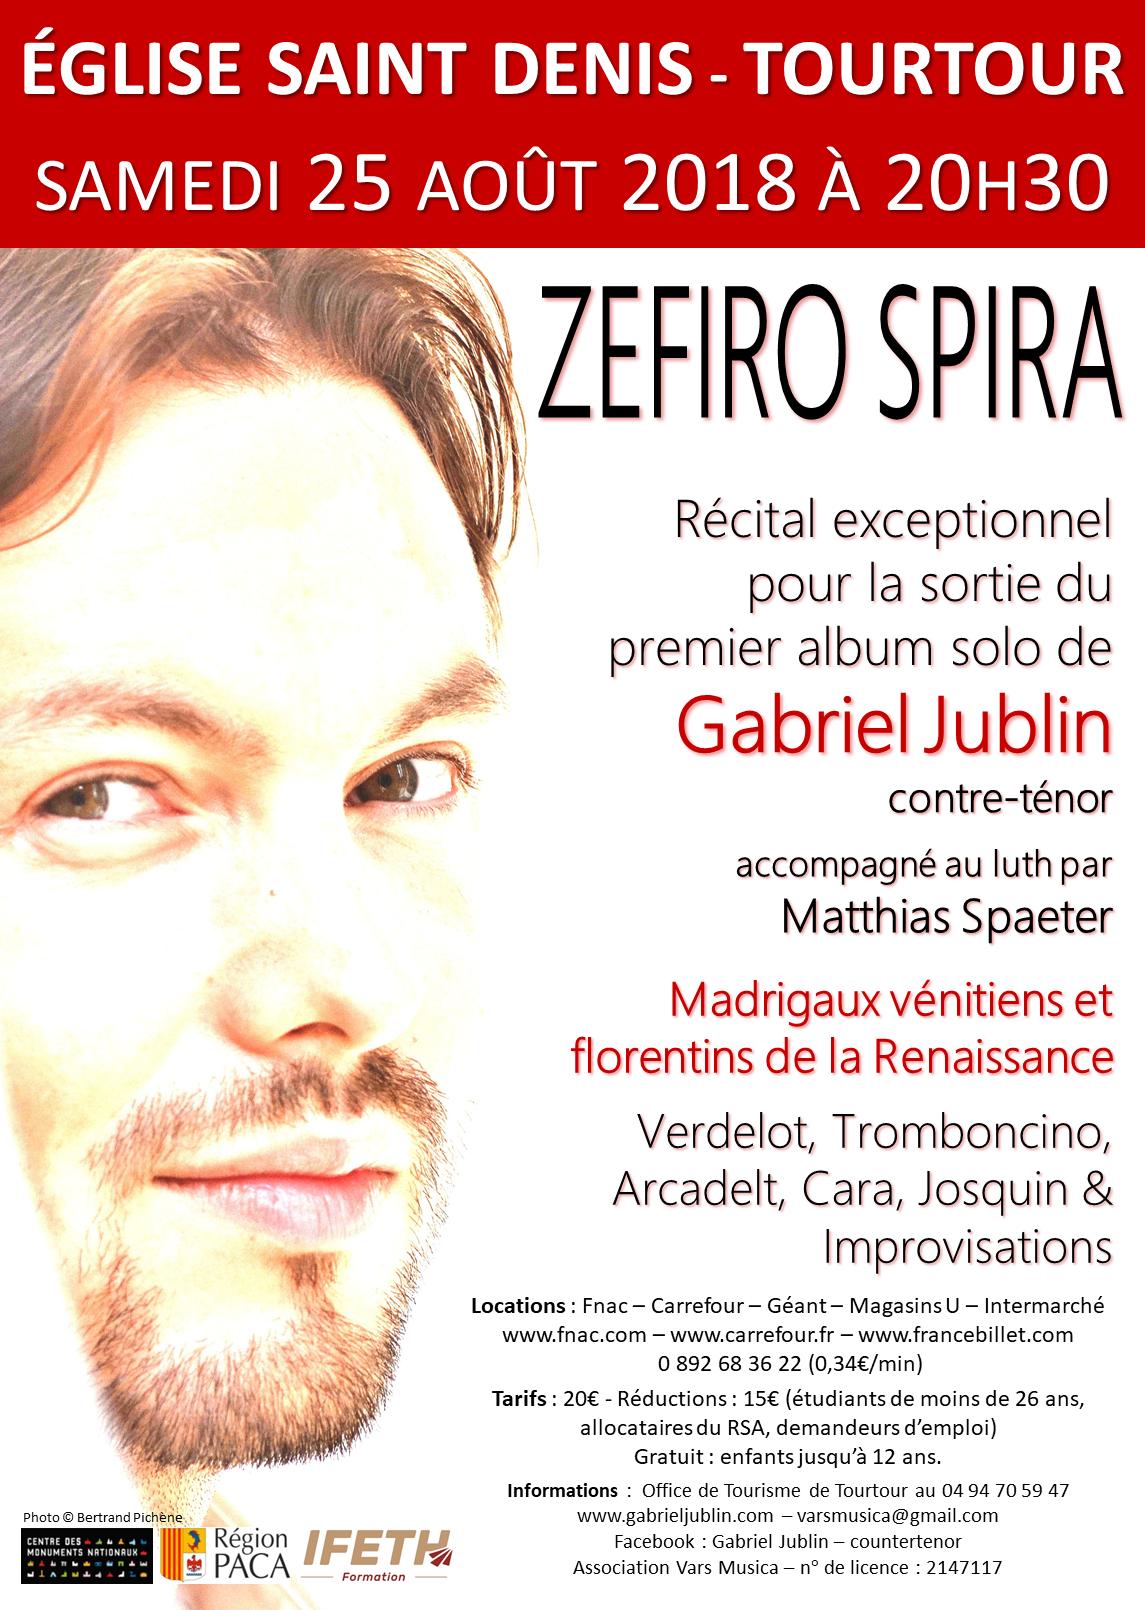 Zefiro spira - Gabriel Jublin, contre-ténor - sortie disque